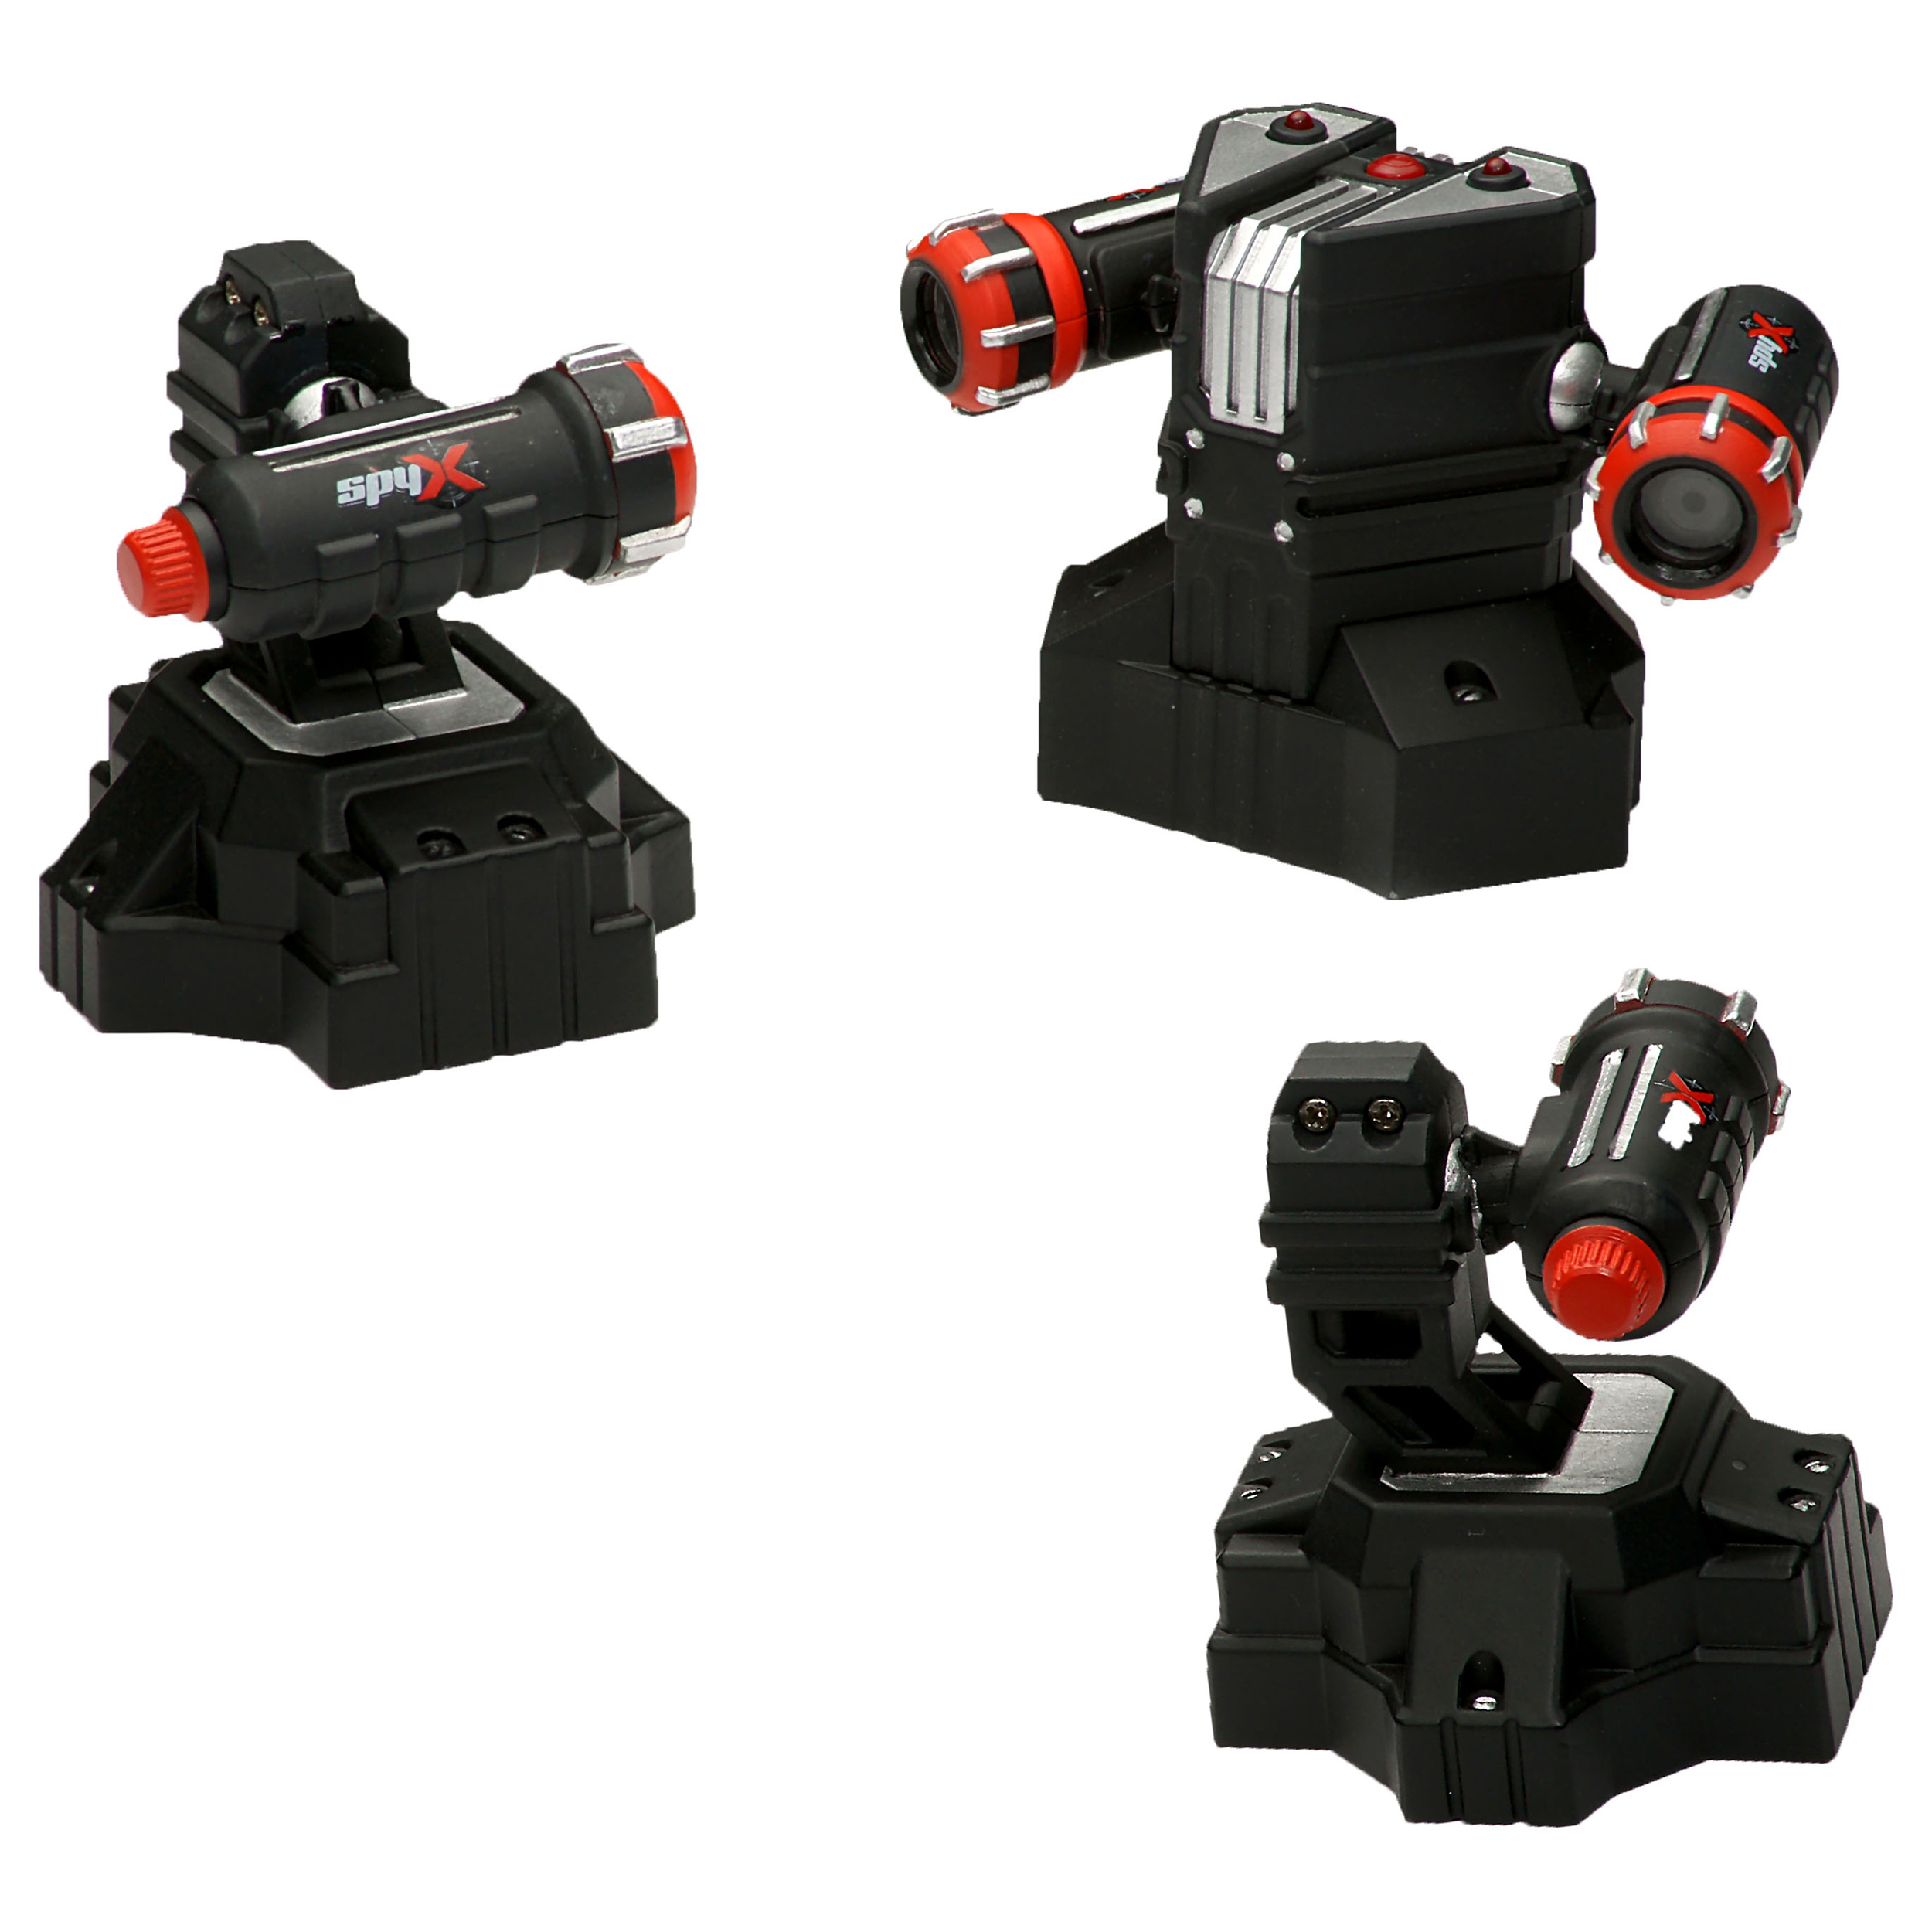 Alarma cu laser Spy X